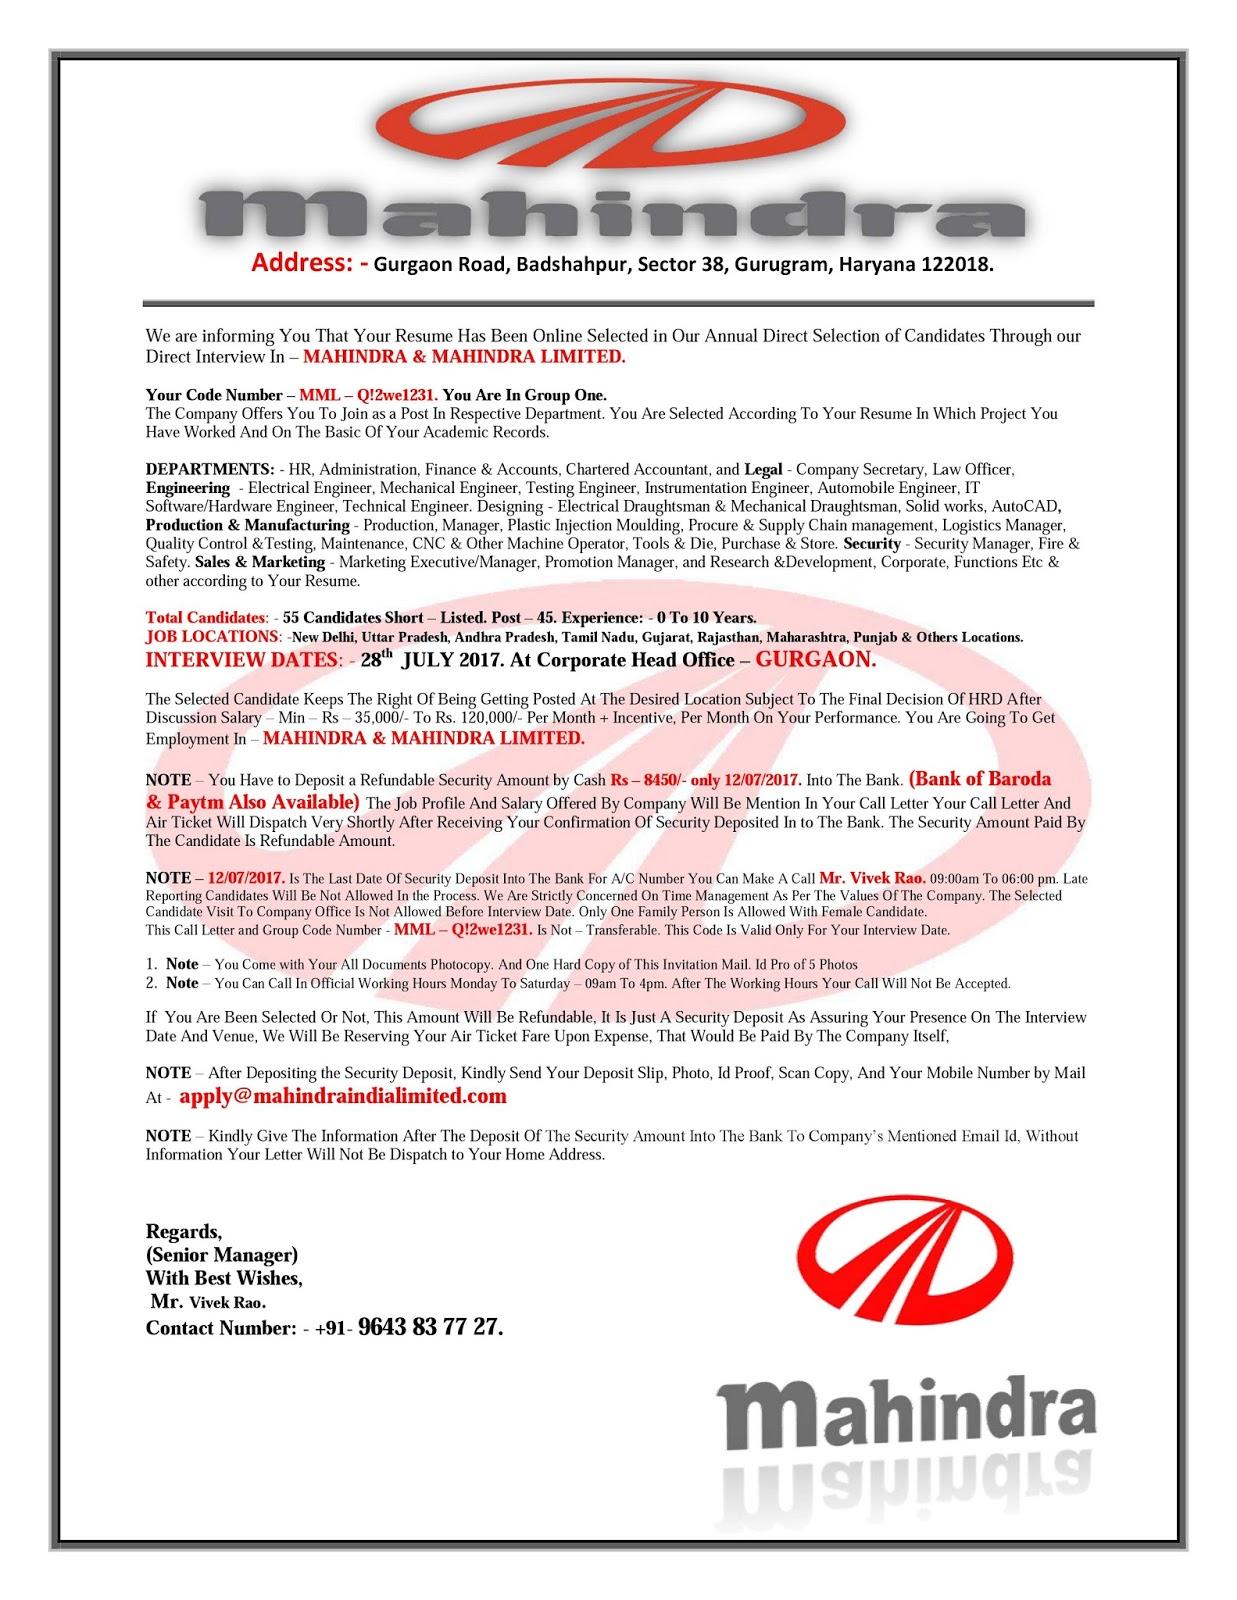 analysis annual report of mahindra and mahindra automobile